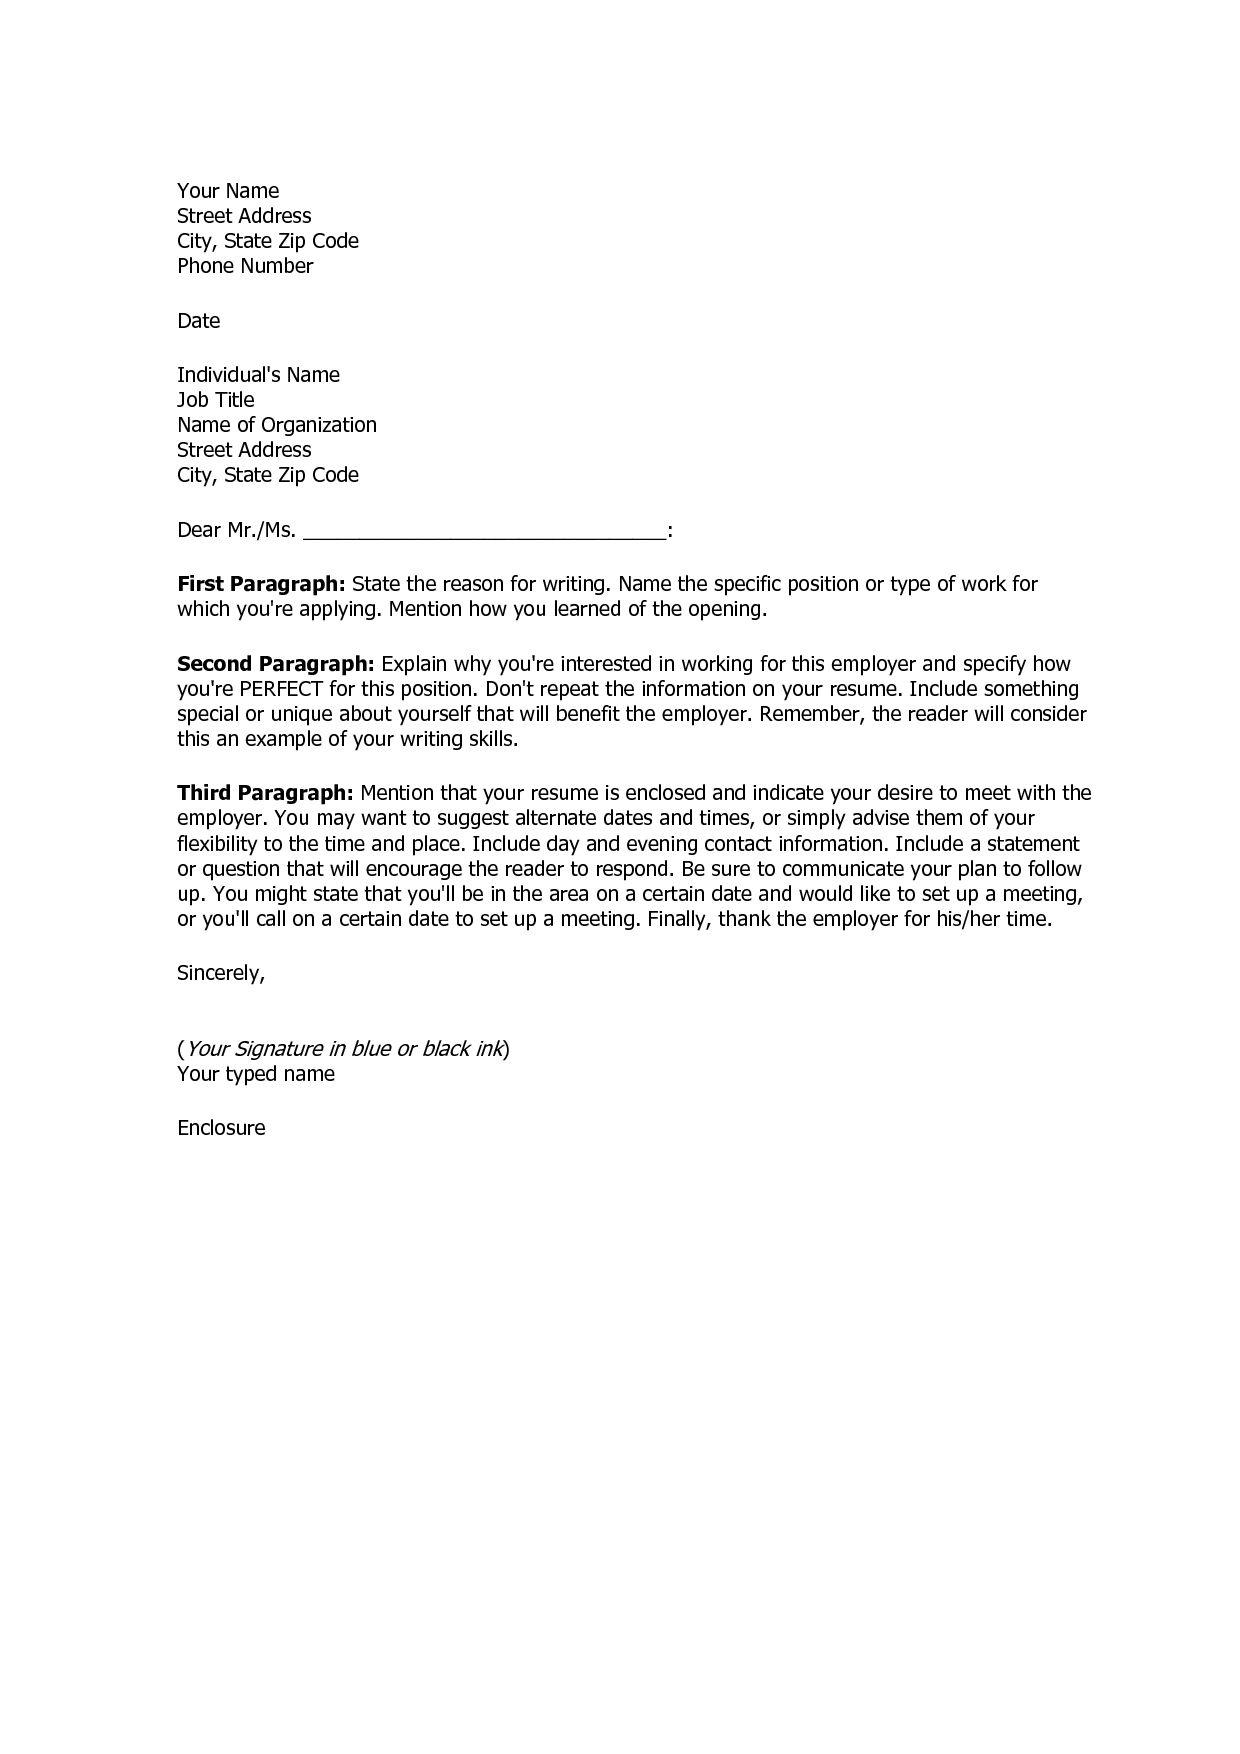 cover letter examles.html